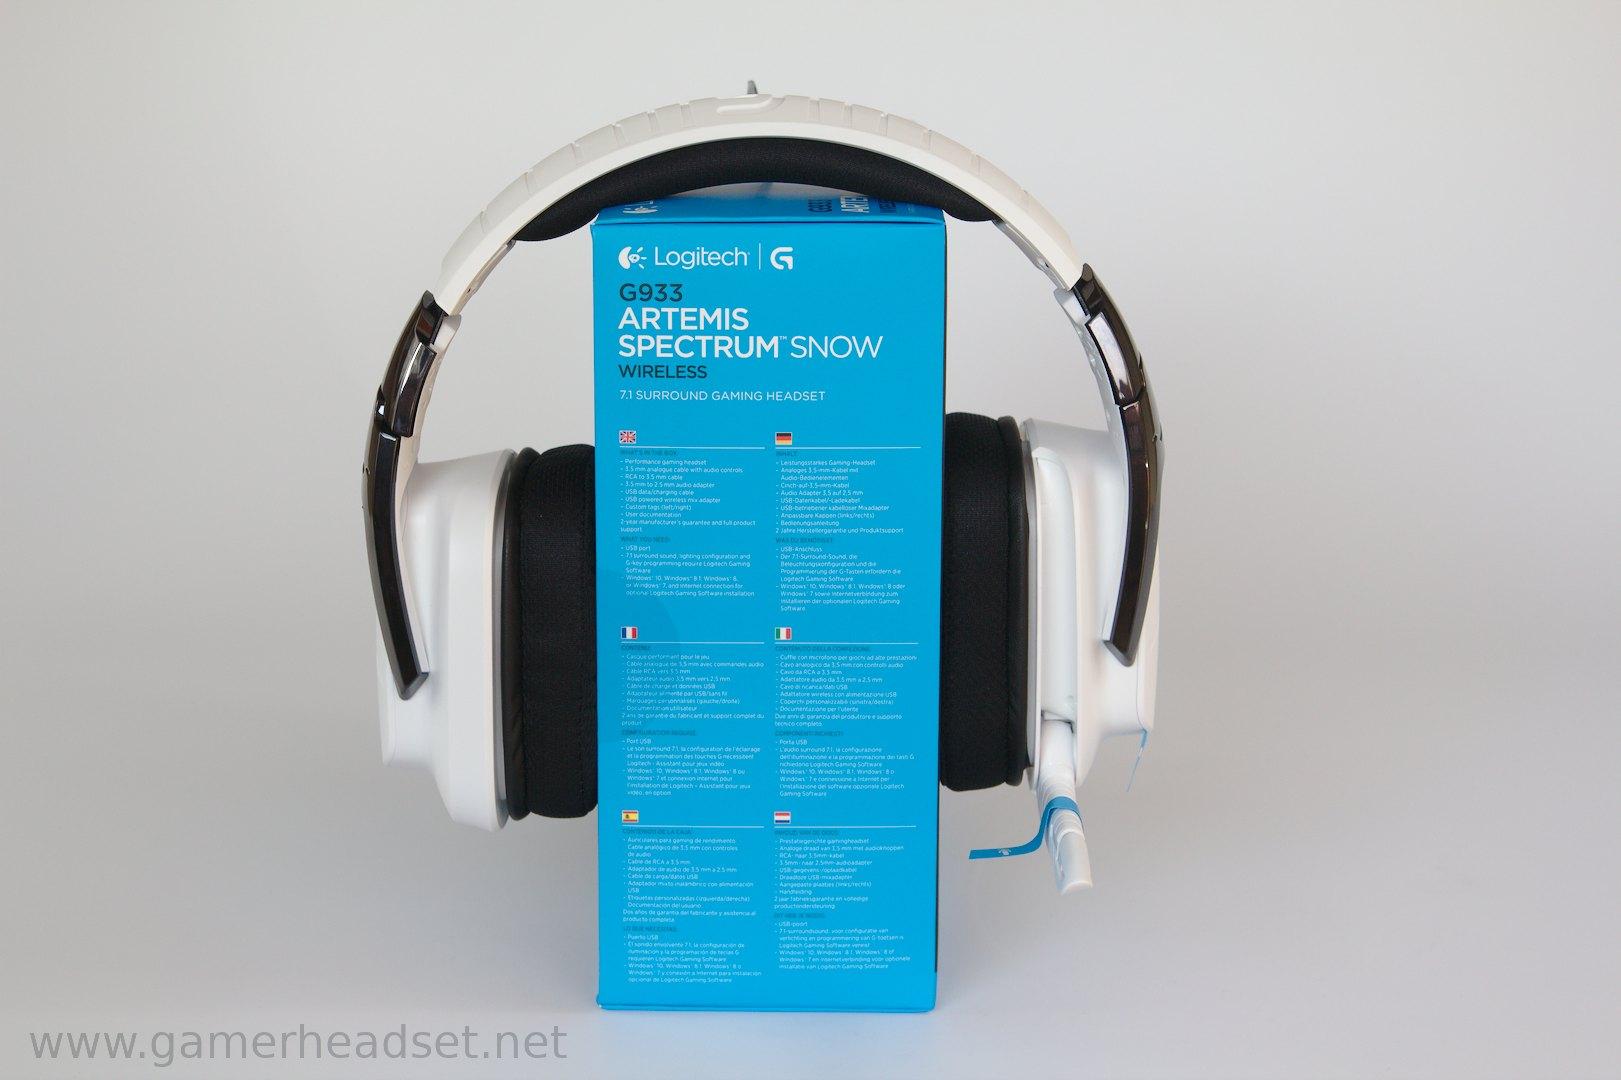 Logitech G on Logitech Usb Headset